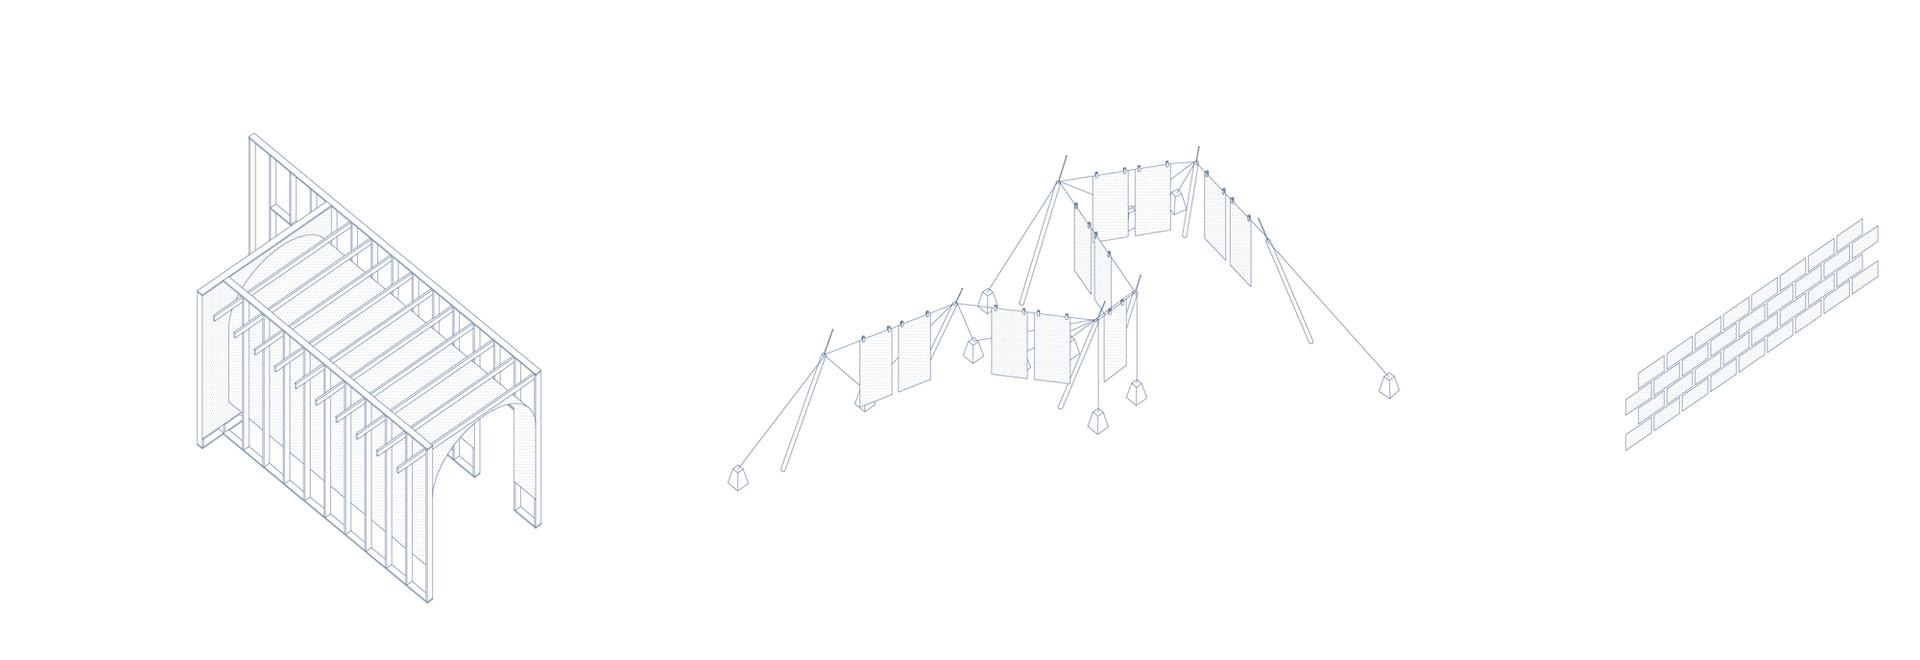 Montaje_axos2-Model.jpg